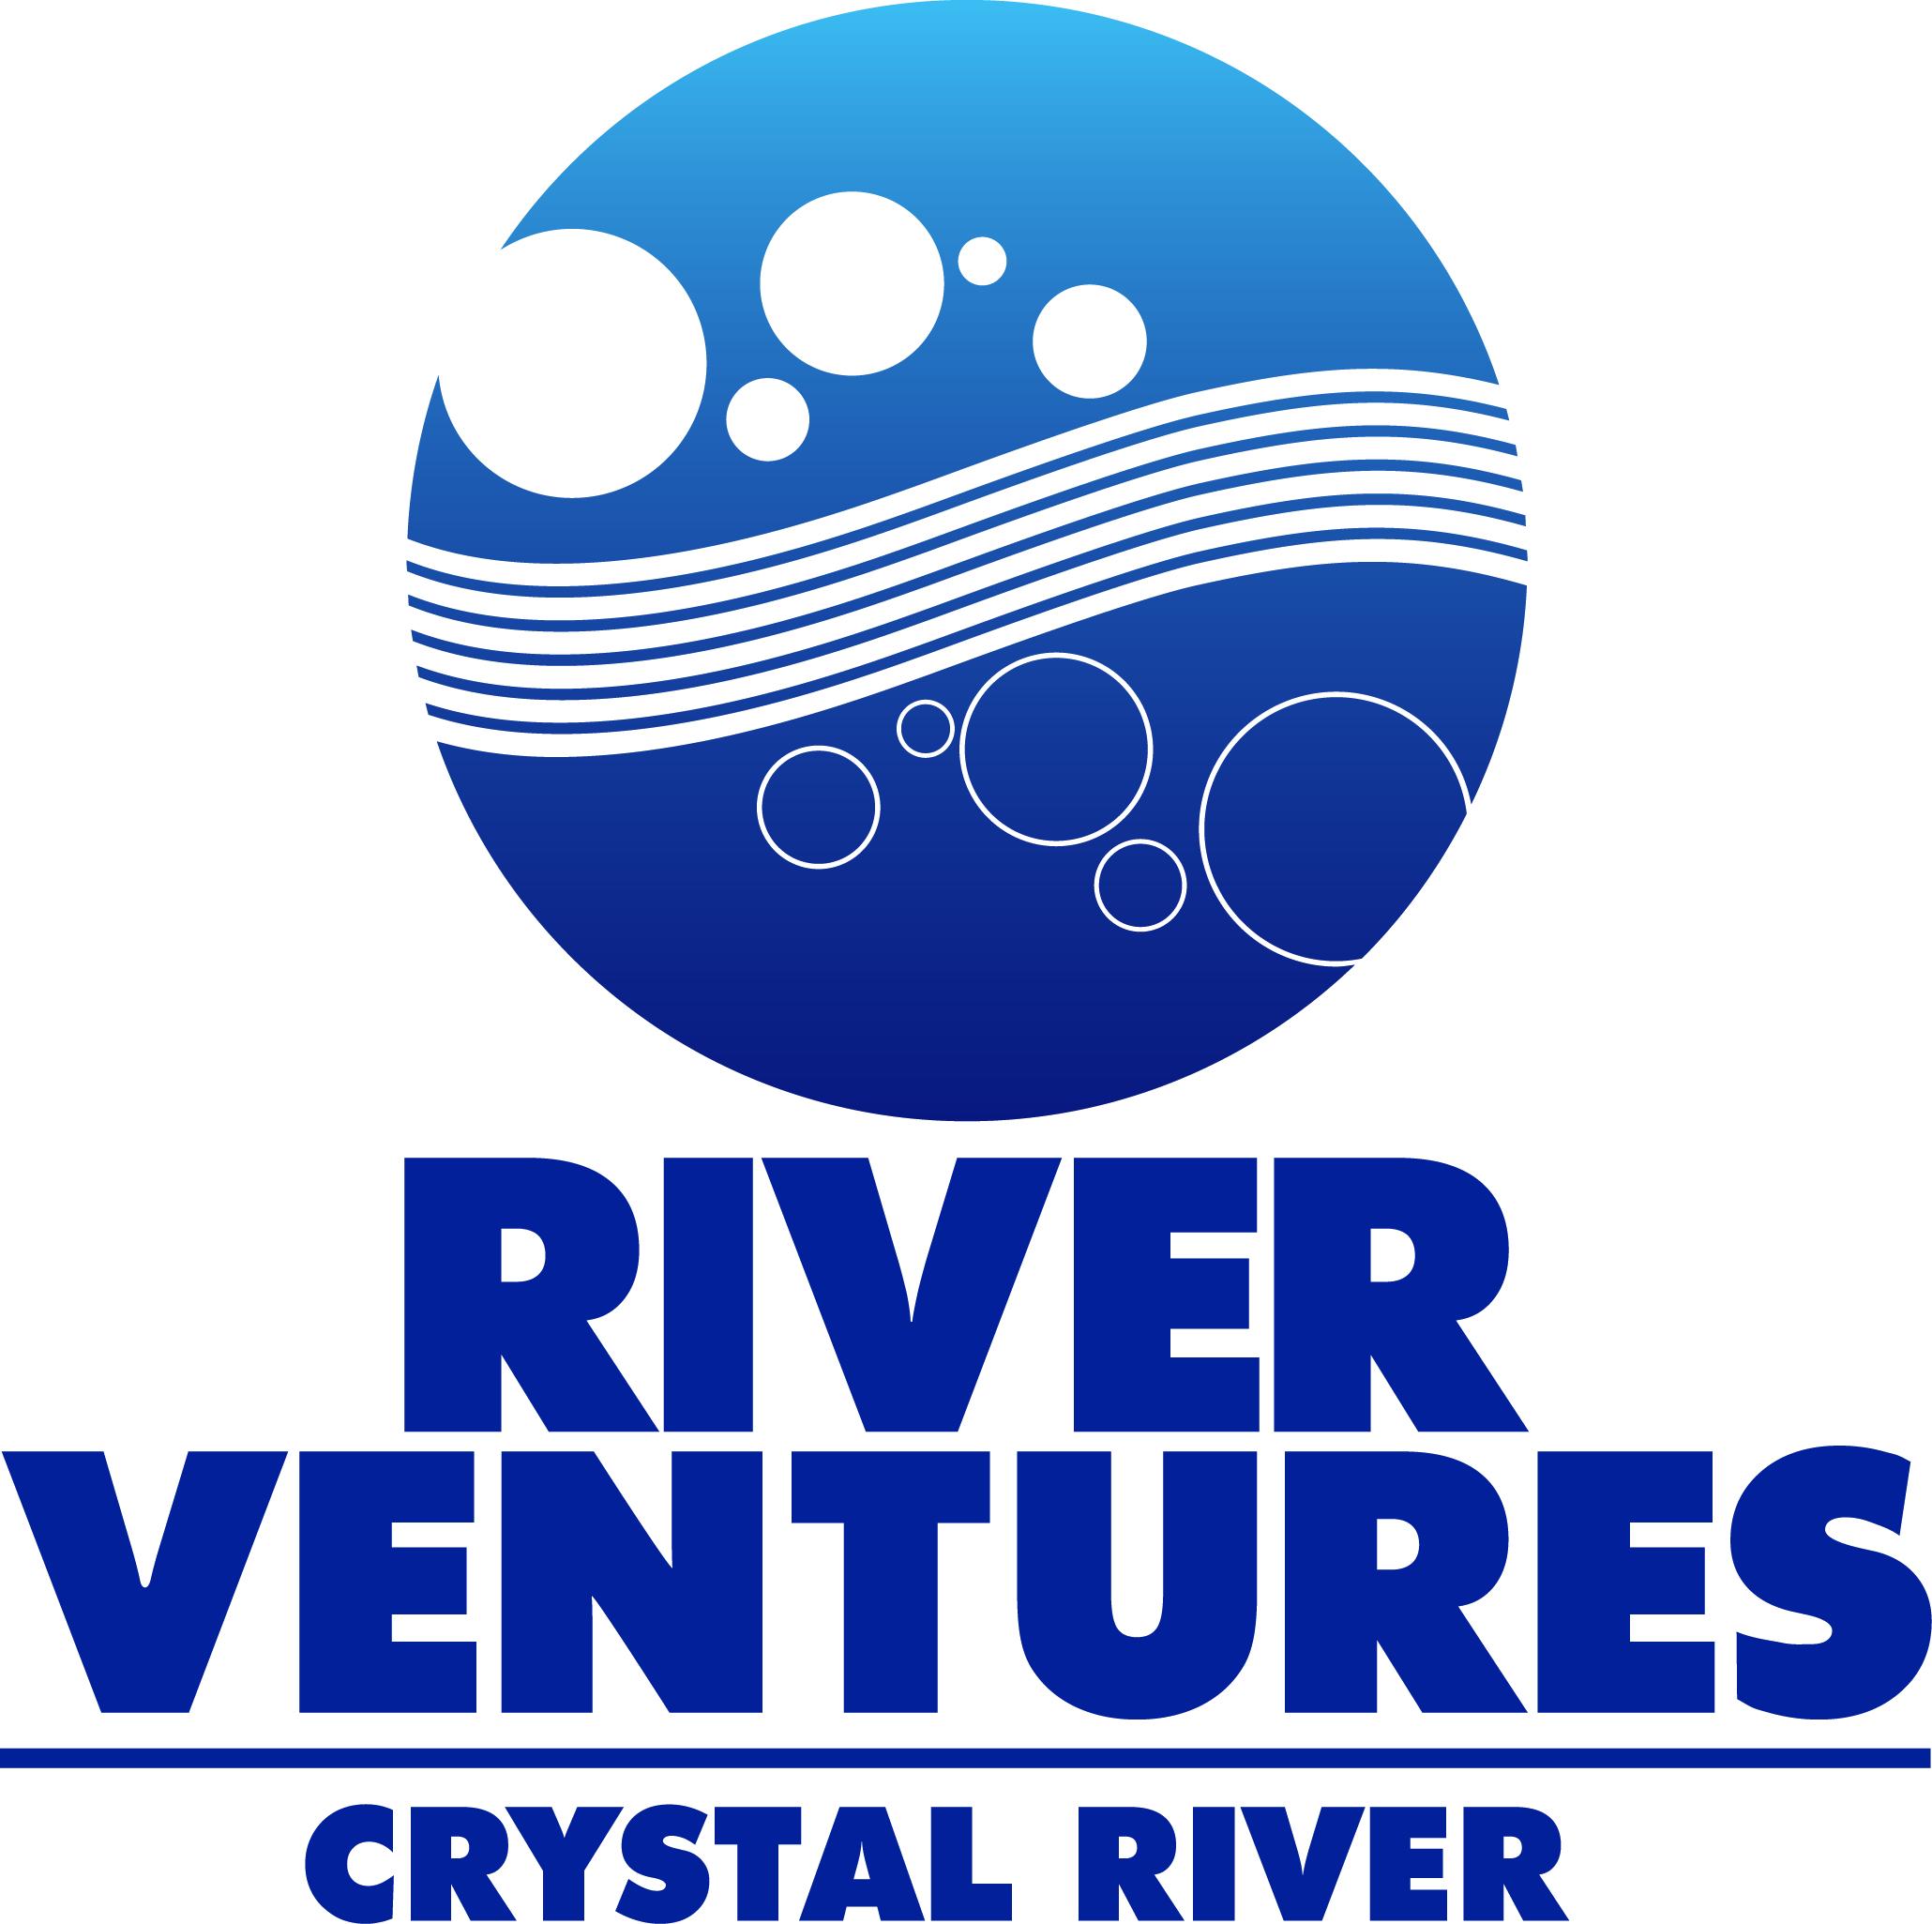 RIVER VENTURES